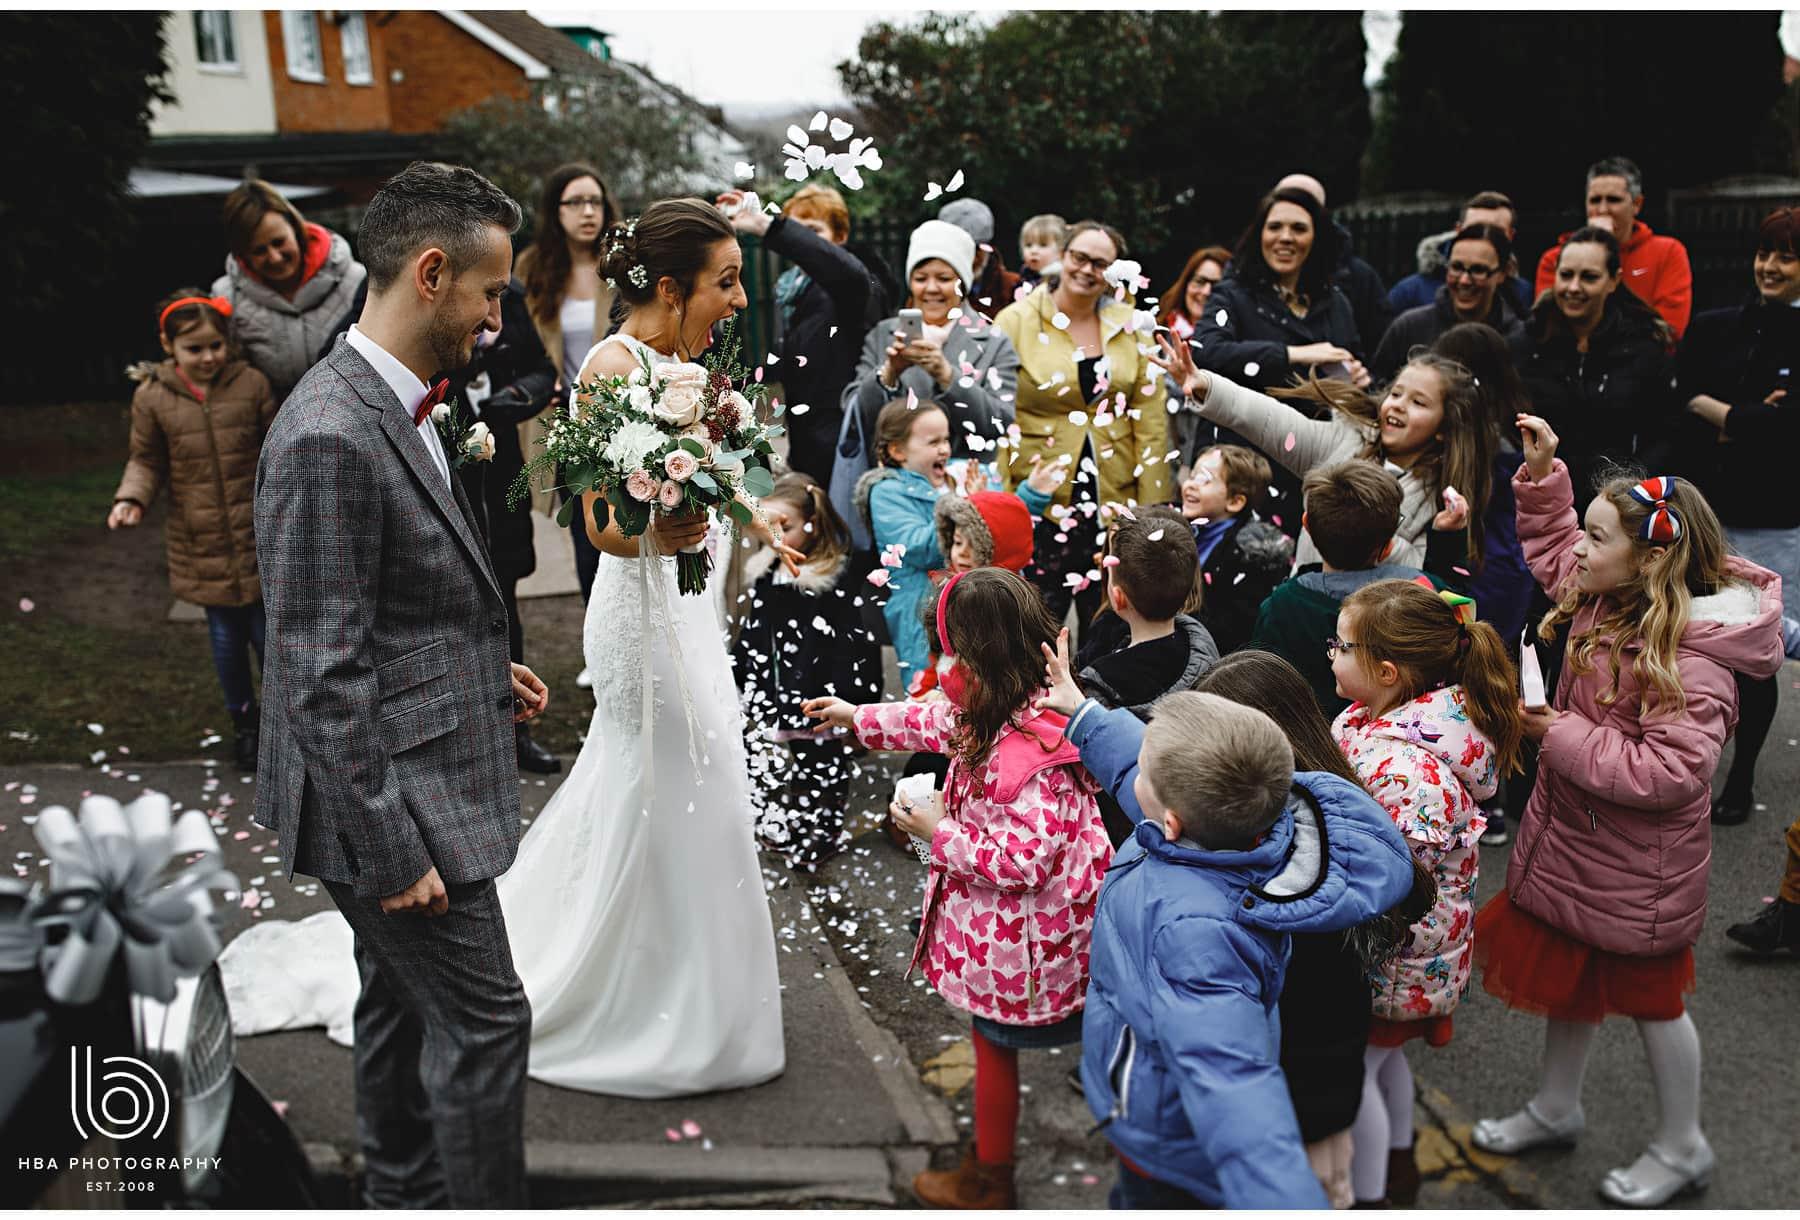 the bride & groom with the brides school children